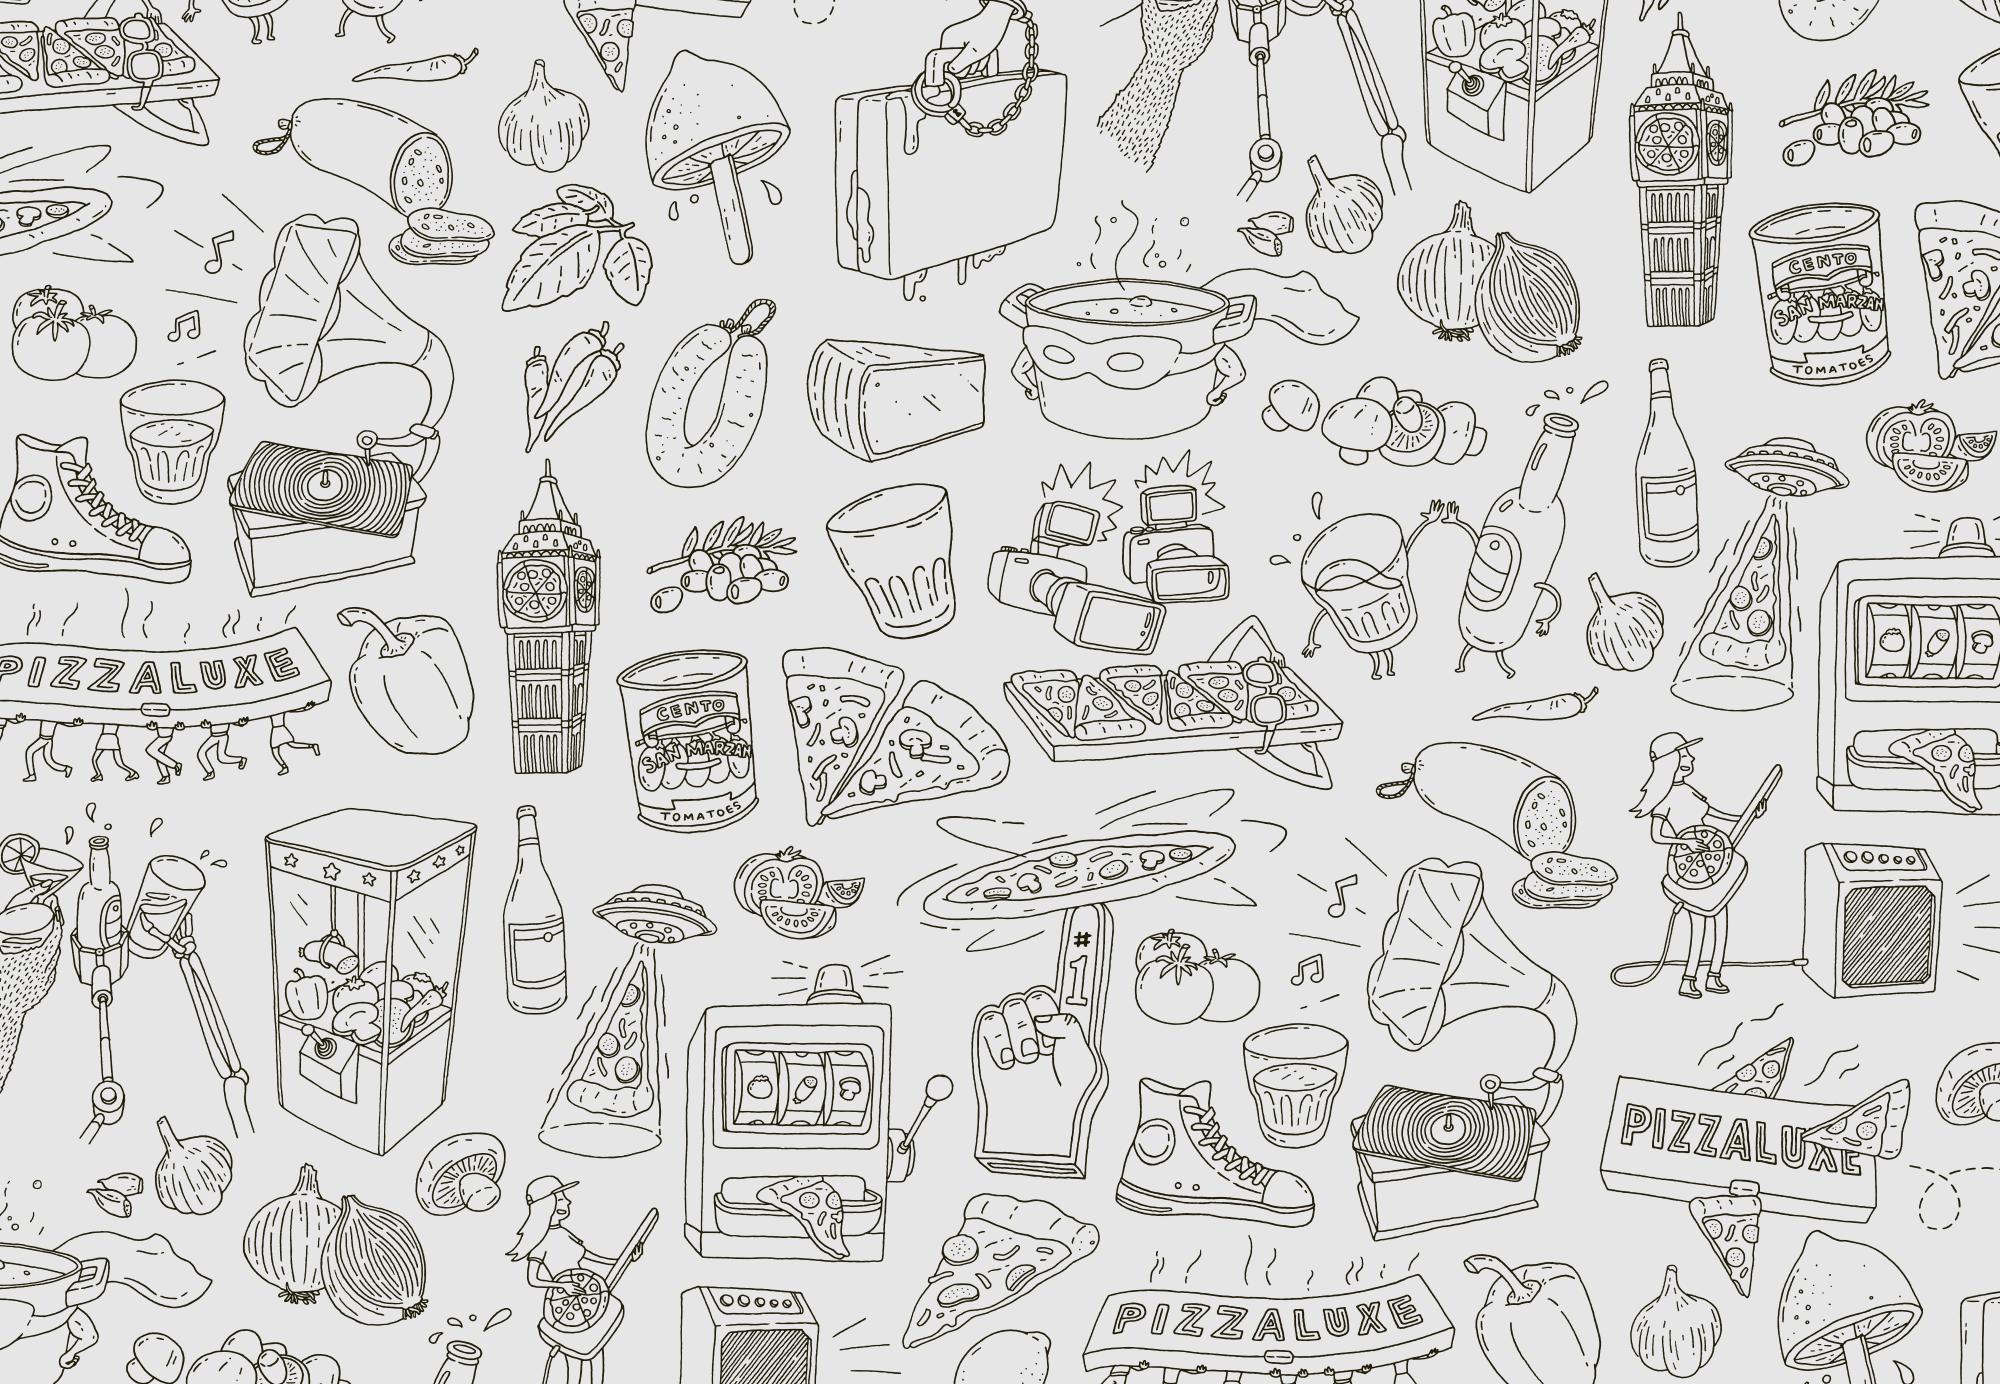 Pizzaluxe Brand Identity Spotlight